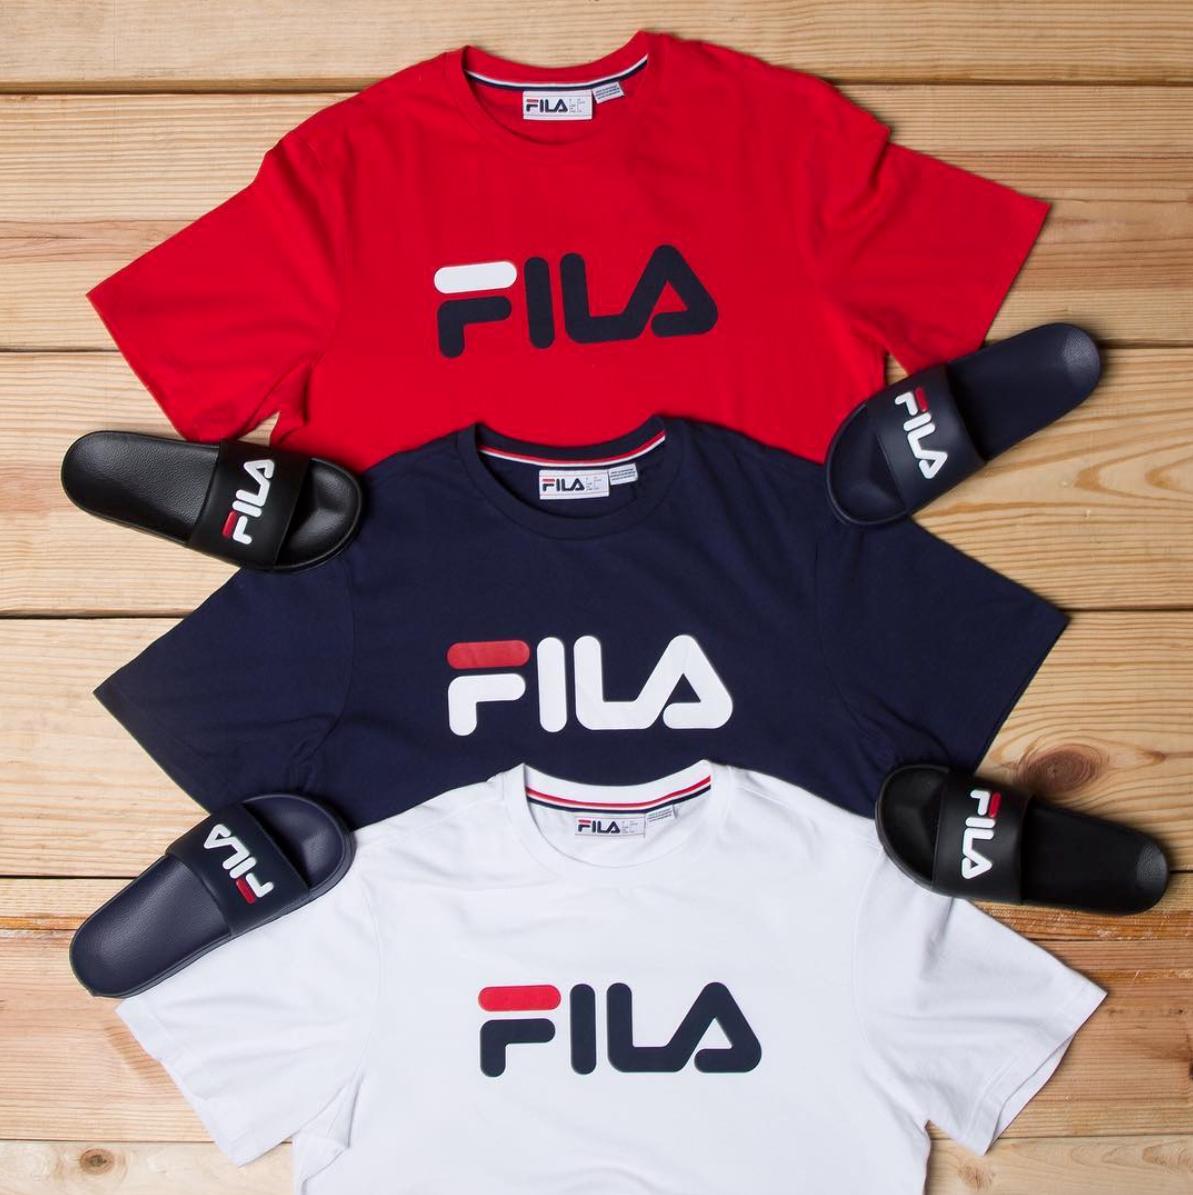 fila-slides-and-shirts